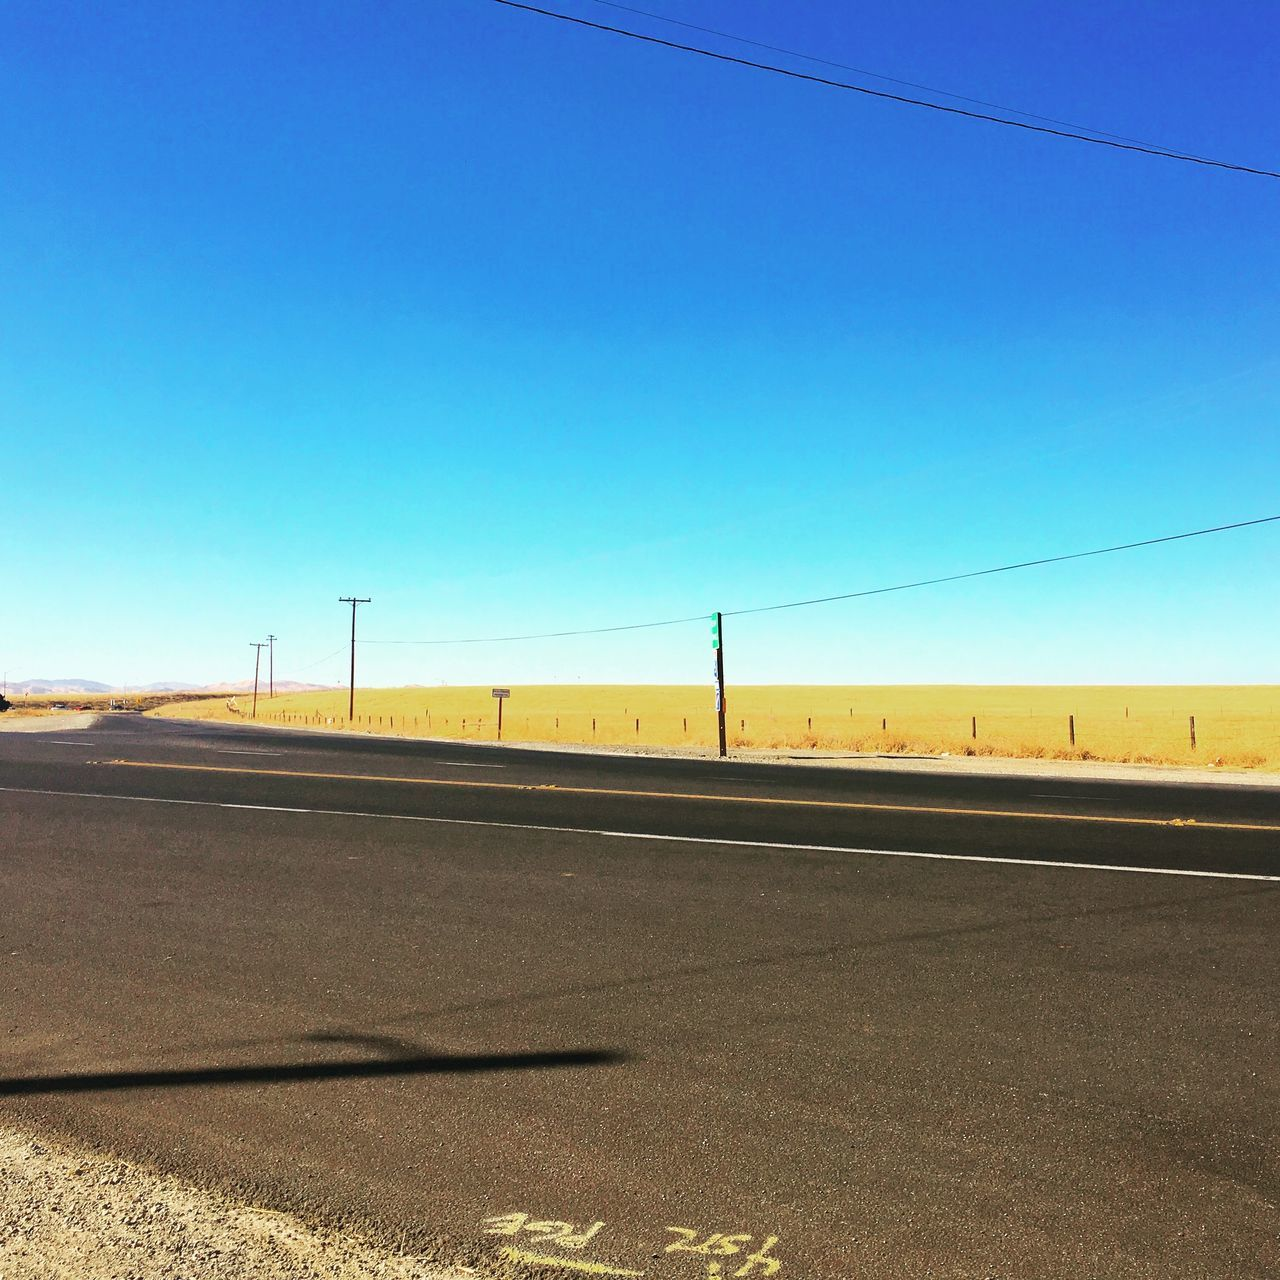 Desert Cali California Road Hot Day Summer Summer Vibes Clear Sky